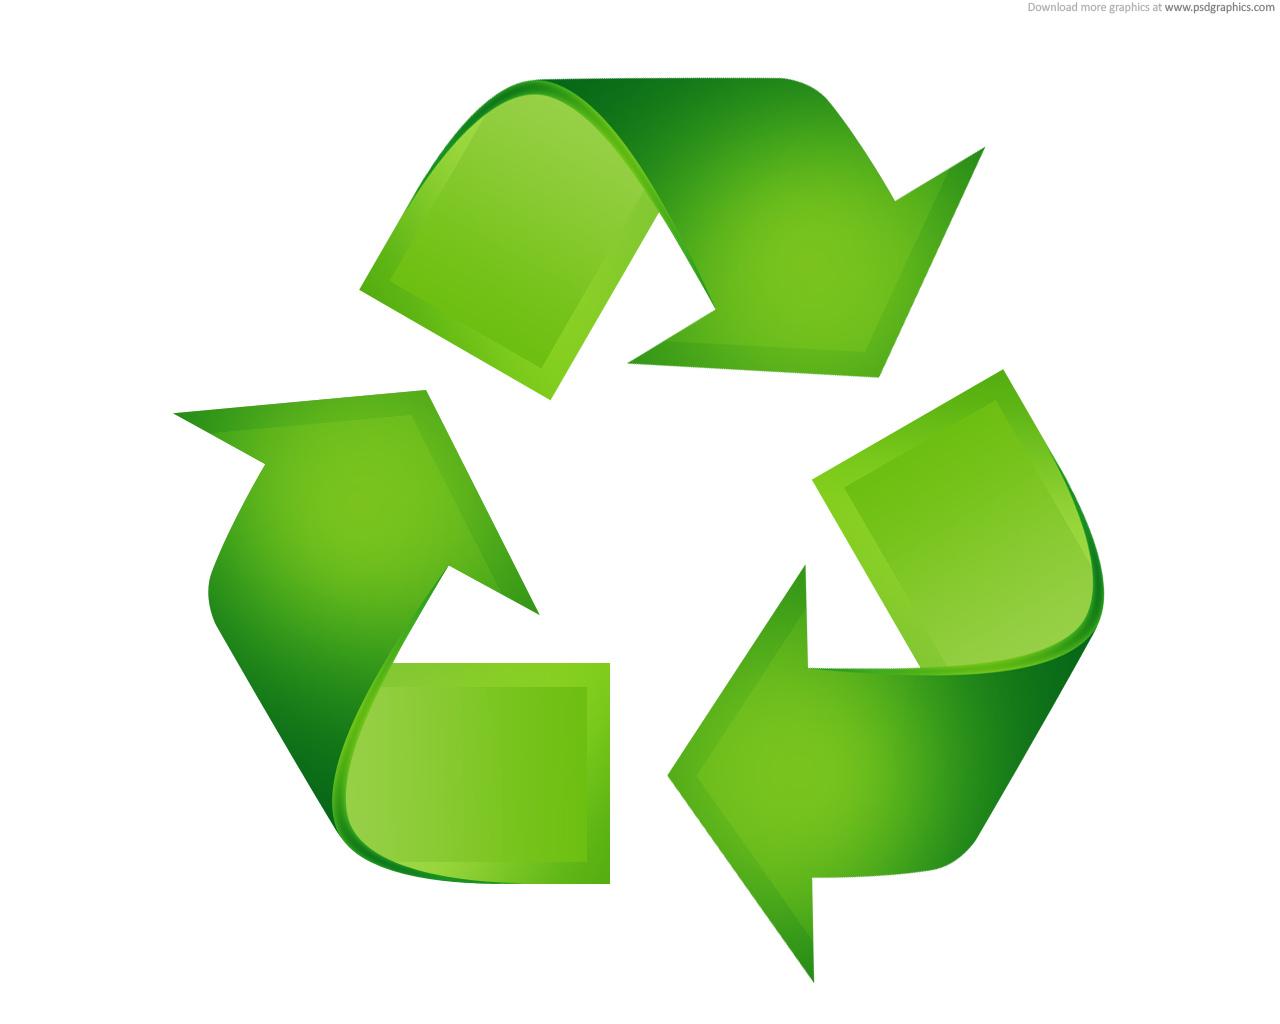 green-recycling-symbol